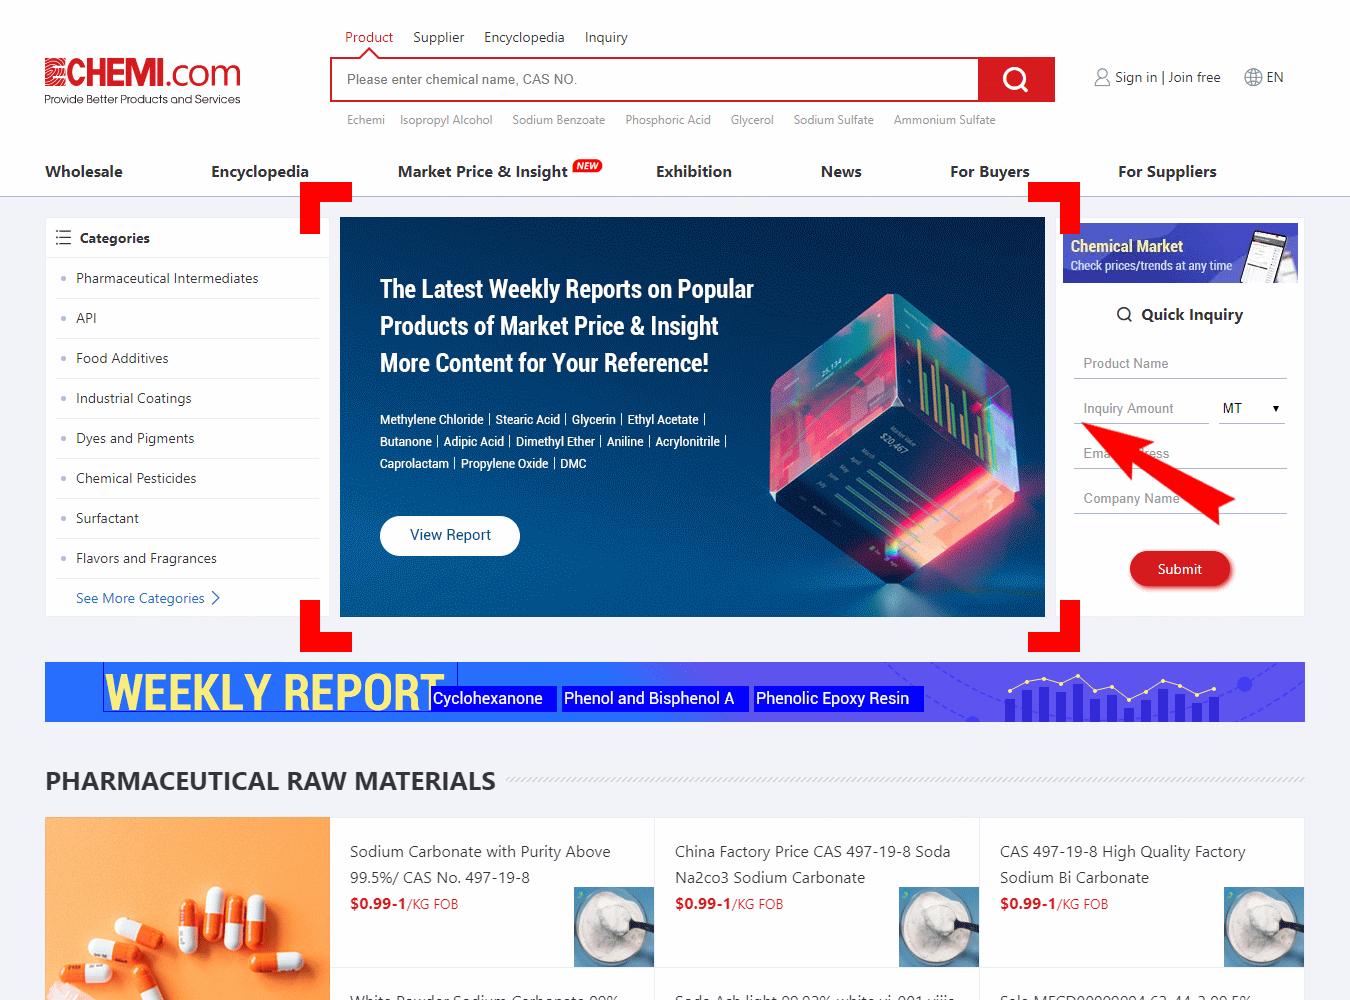 Homepage A1 display